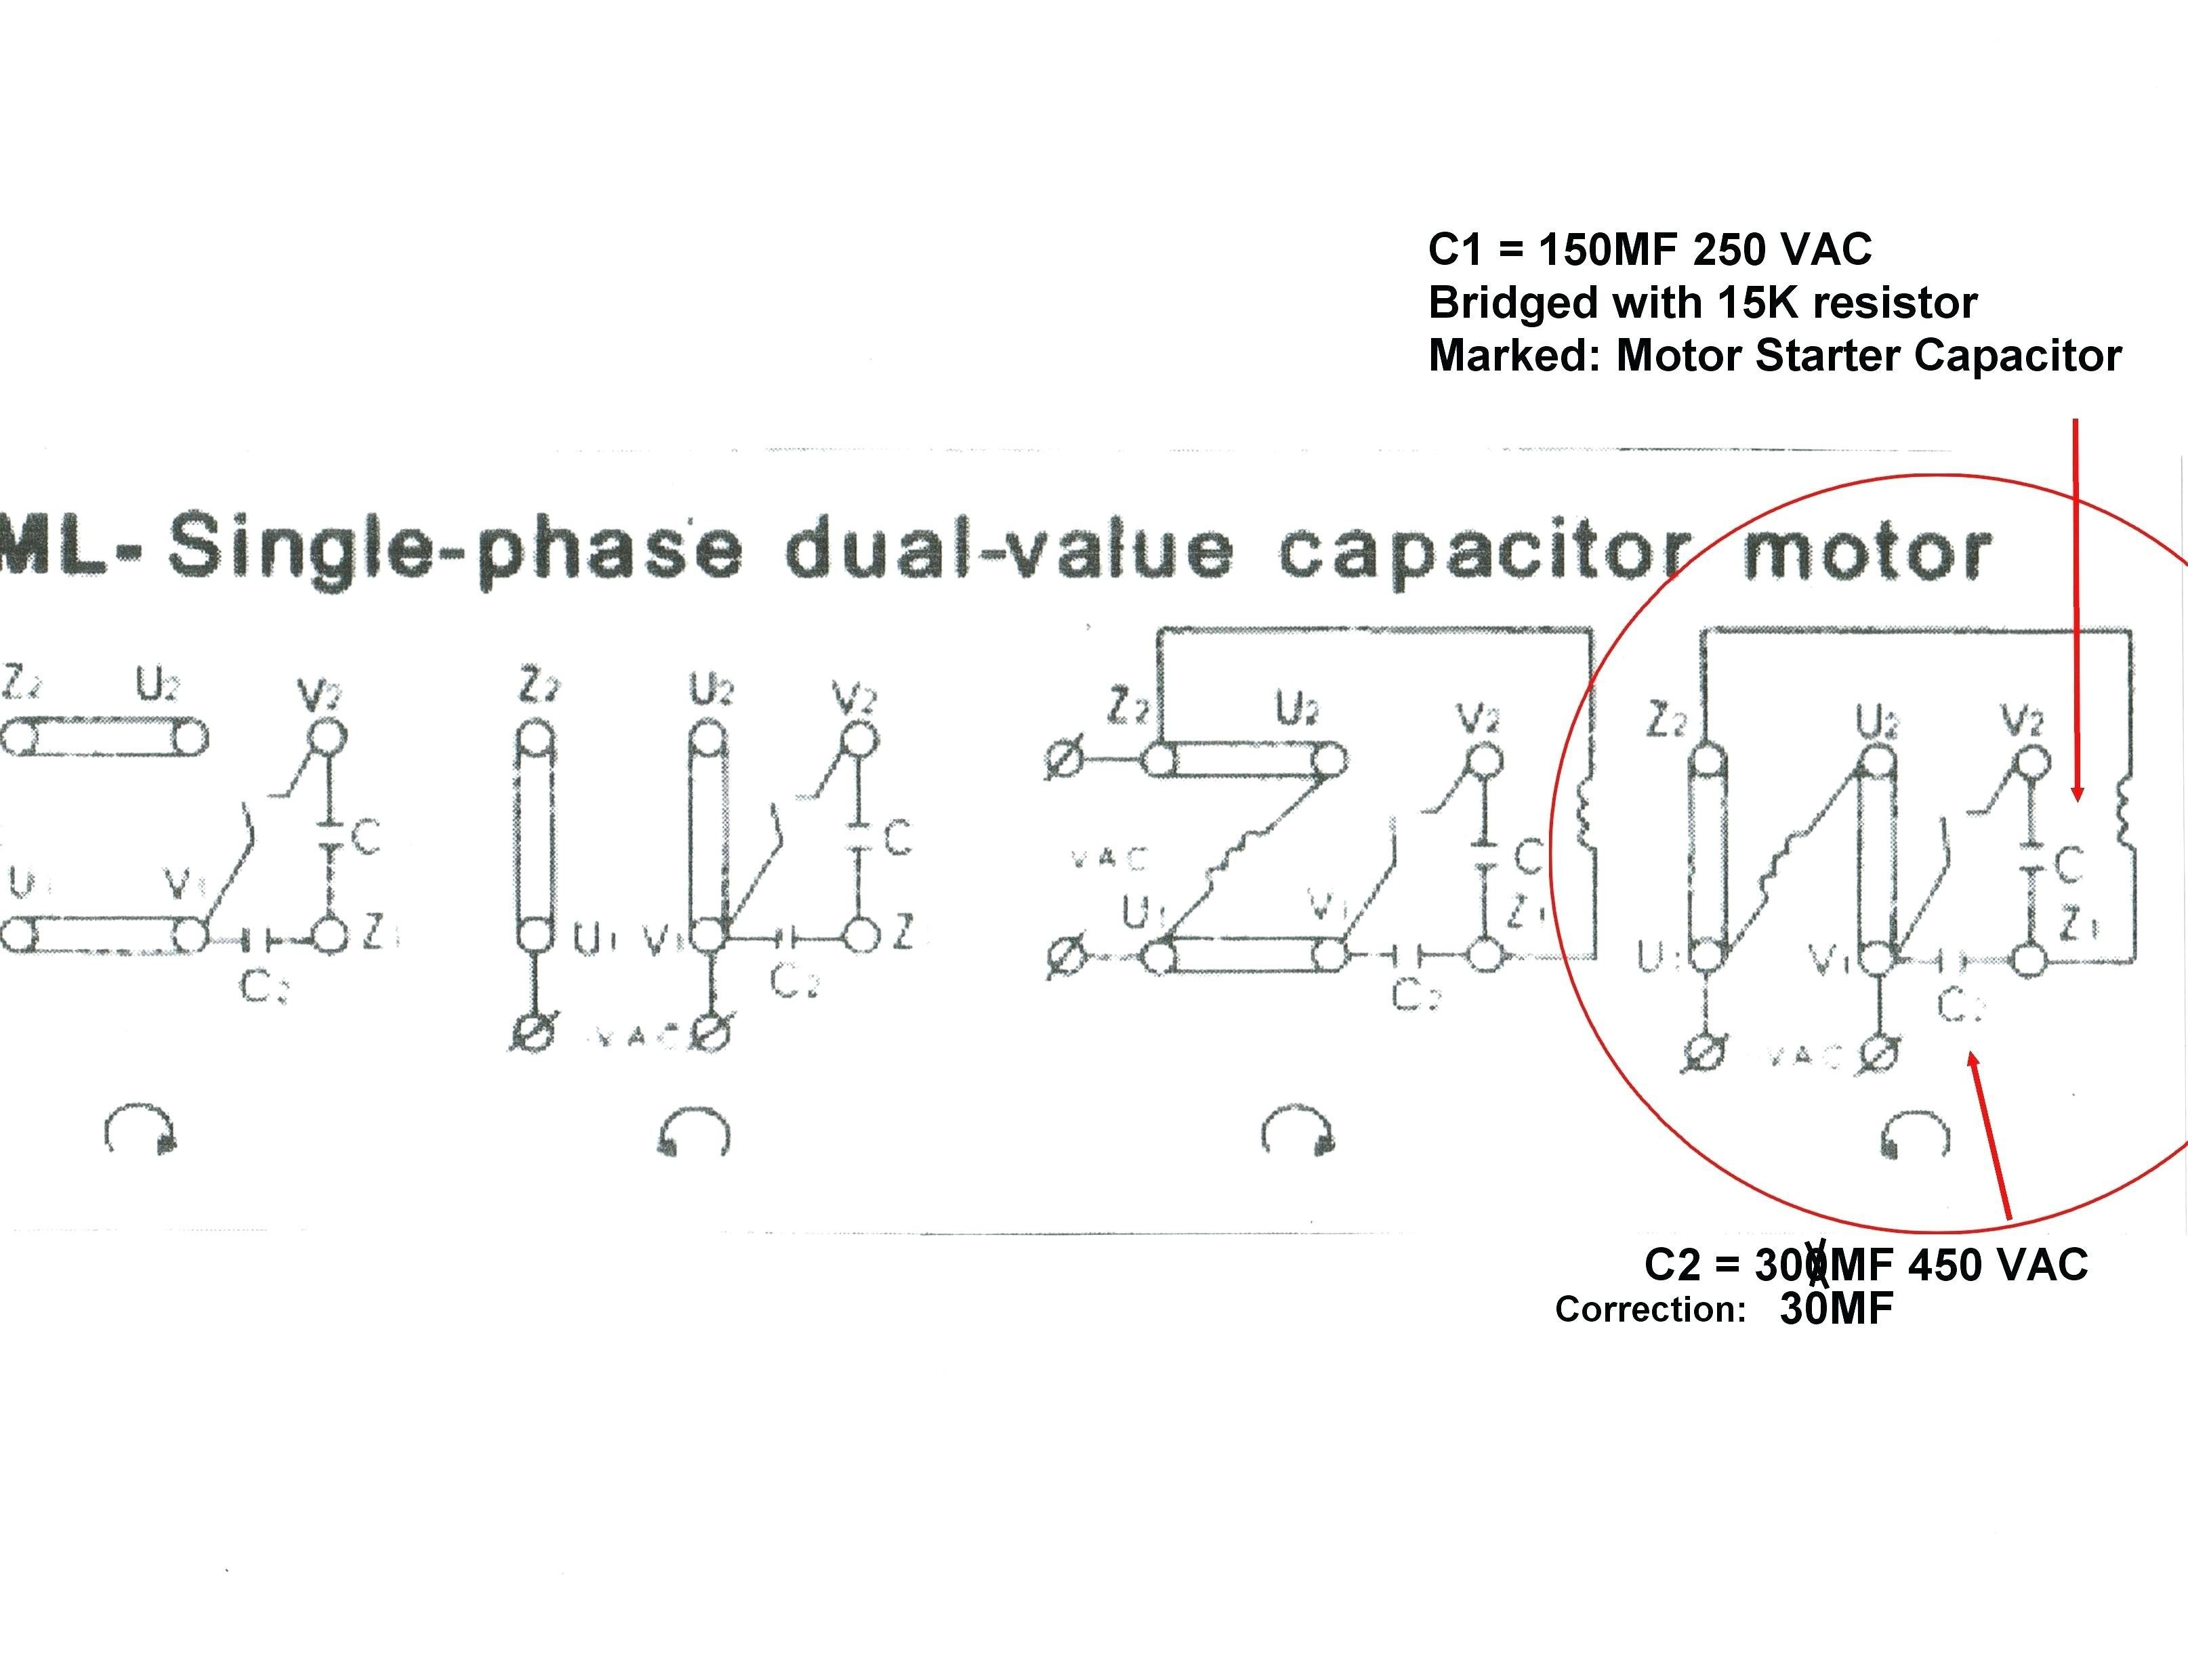 Electric Motor Wiring Diagram Single Phase Century Electric Motor Wiring Diagram Luxury Single and Britishpanto Of Electric Motor Wiring Diagram Single Phase